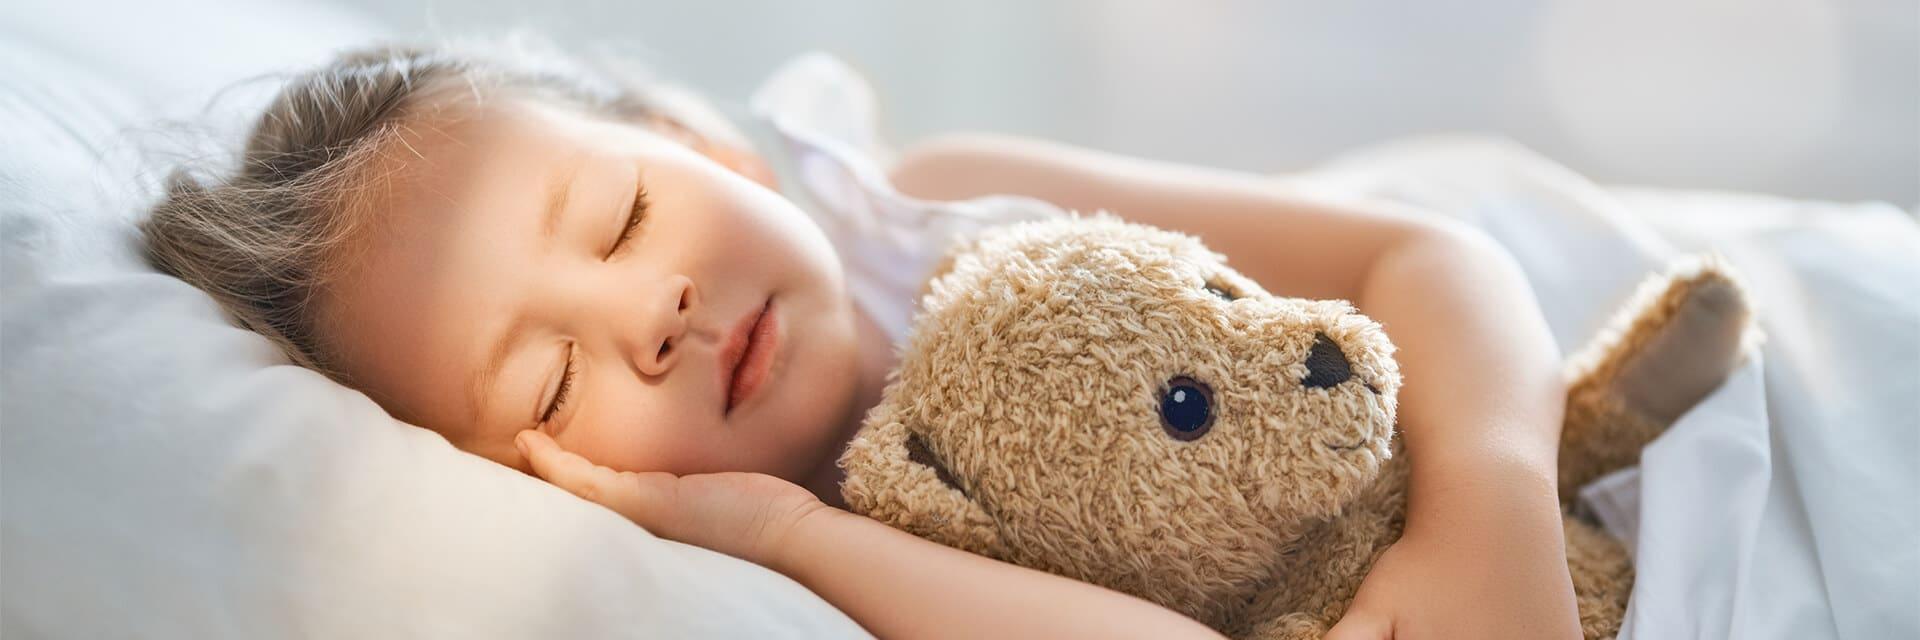 Child safe in bed